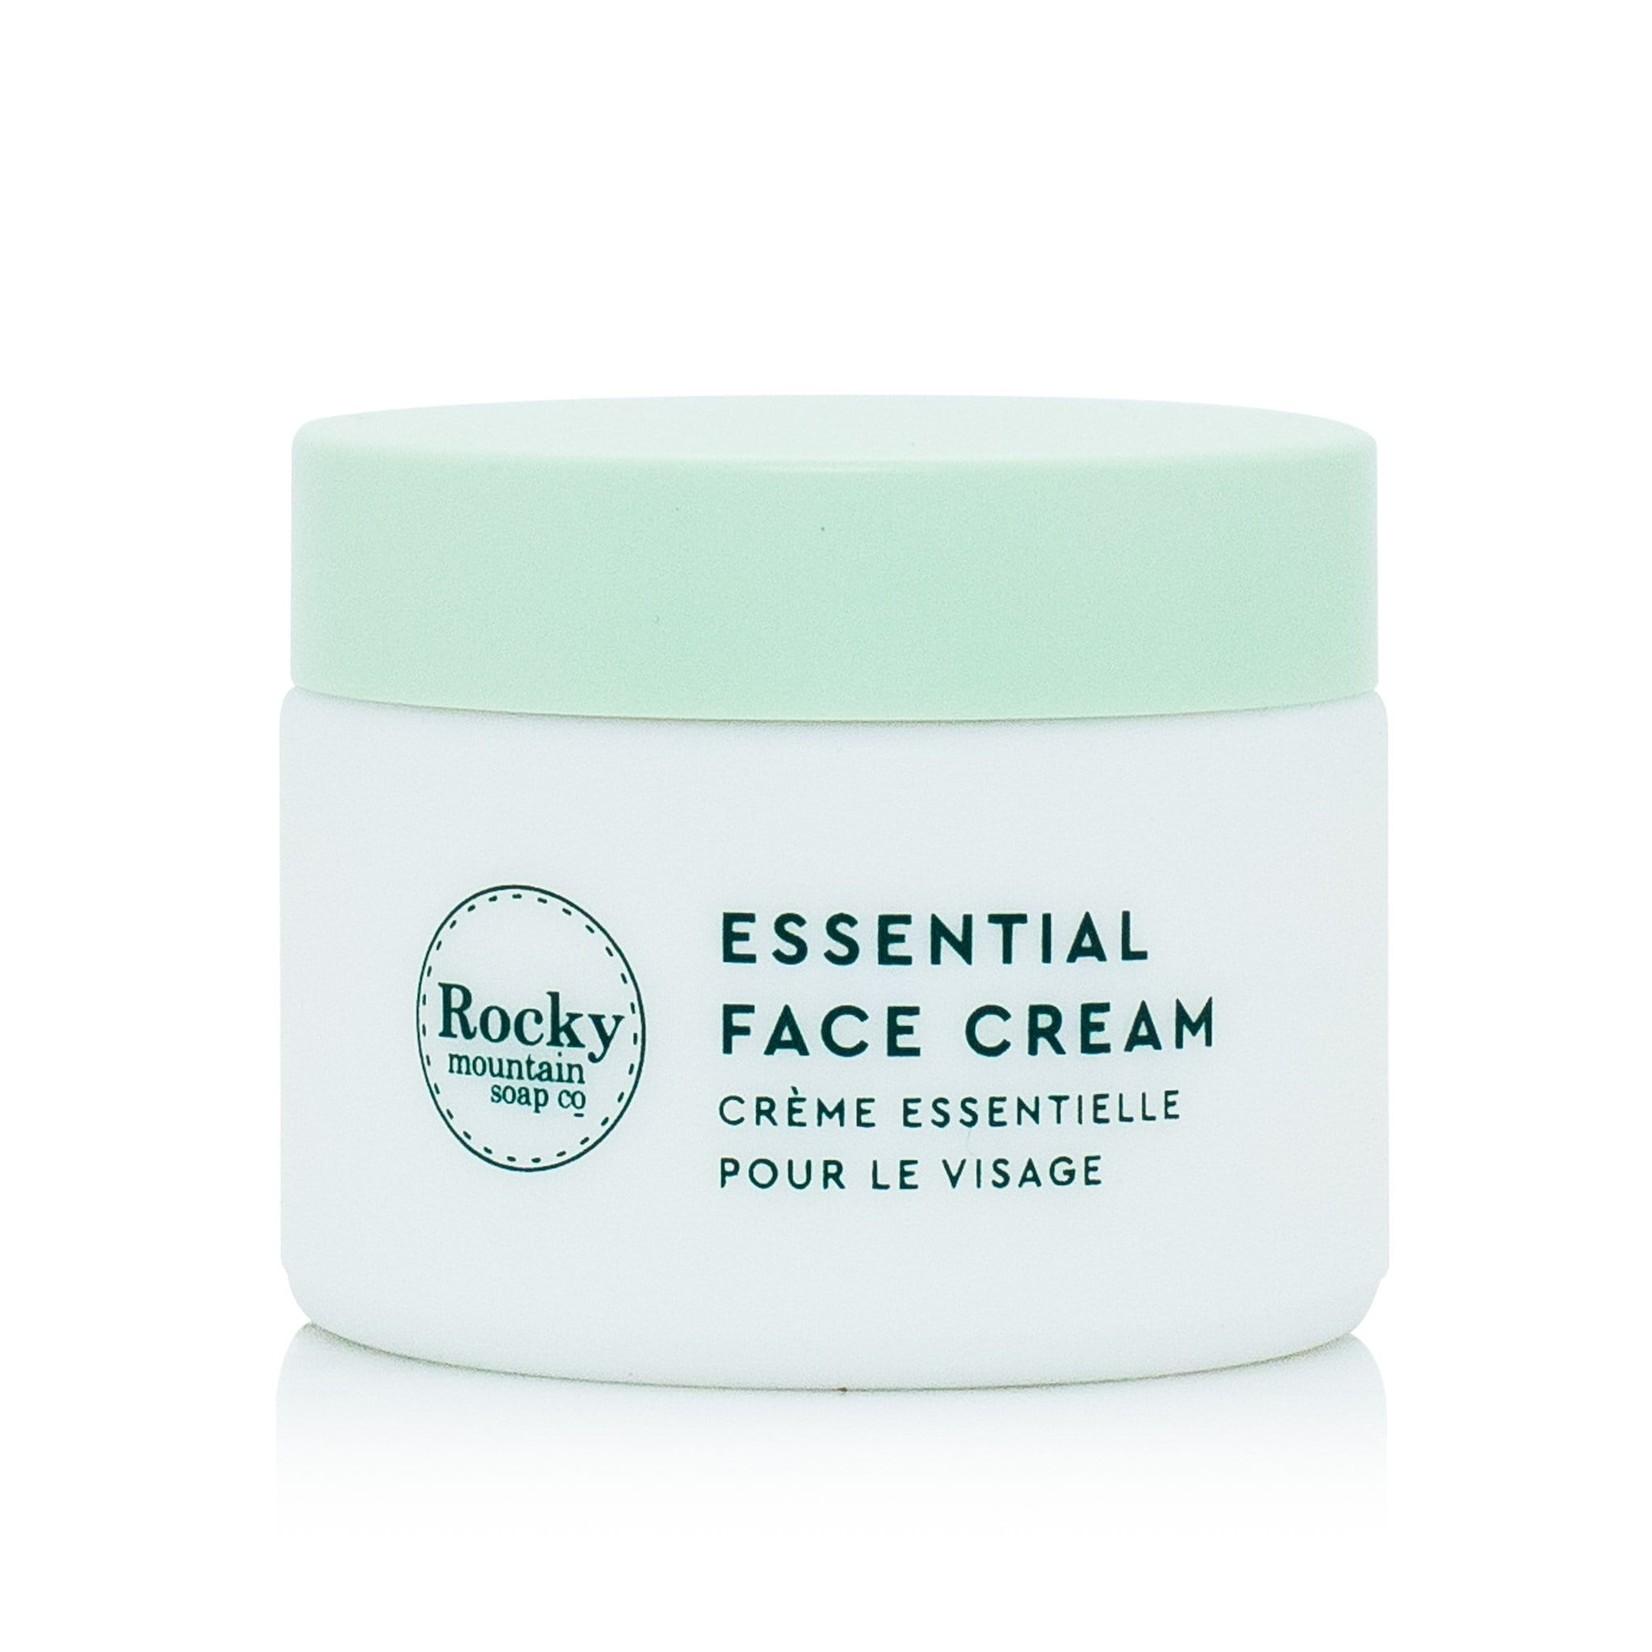 ROCKY MOUNTAIN SOAP CO. ESSENTIAL FACE CREAM